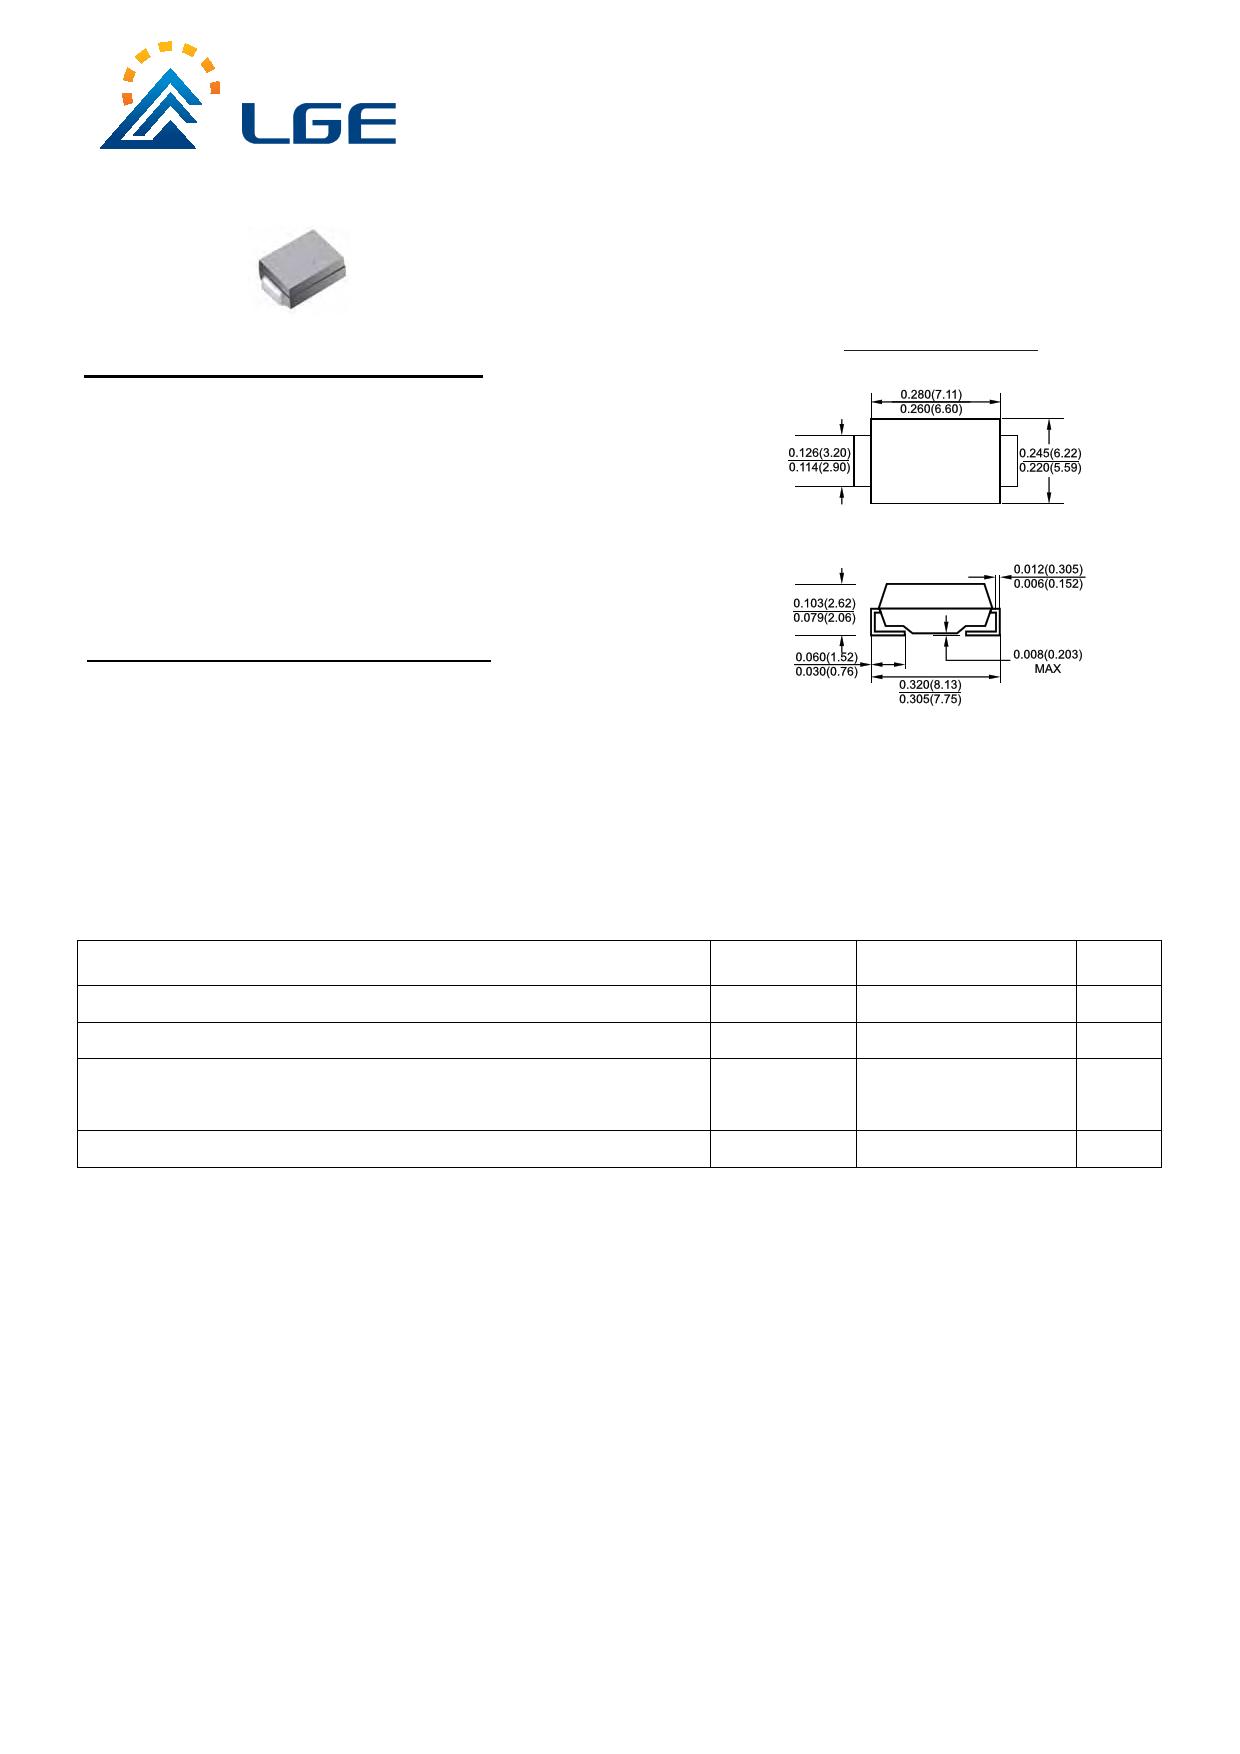 3.0SMCJ100CA Datasheet, 3.0SMCJ100CA PDF,ピン配置, 機能